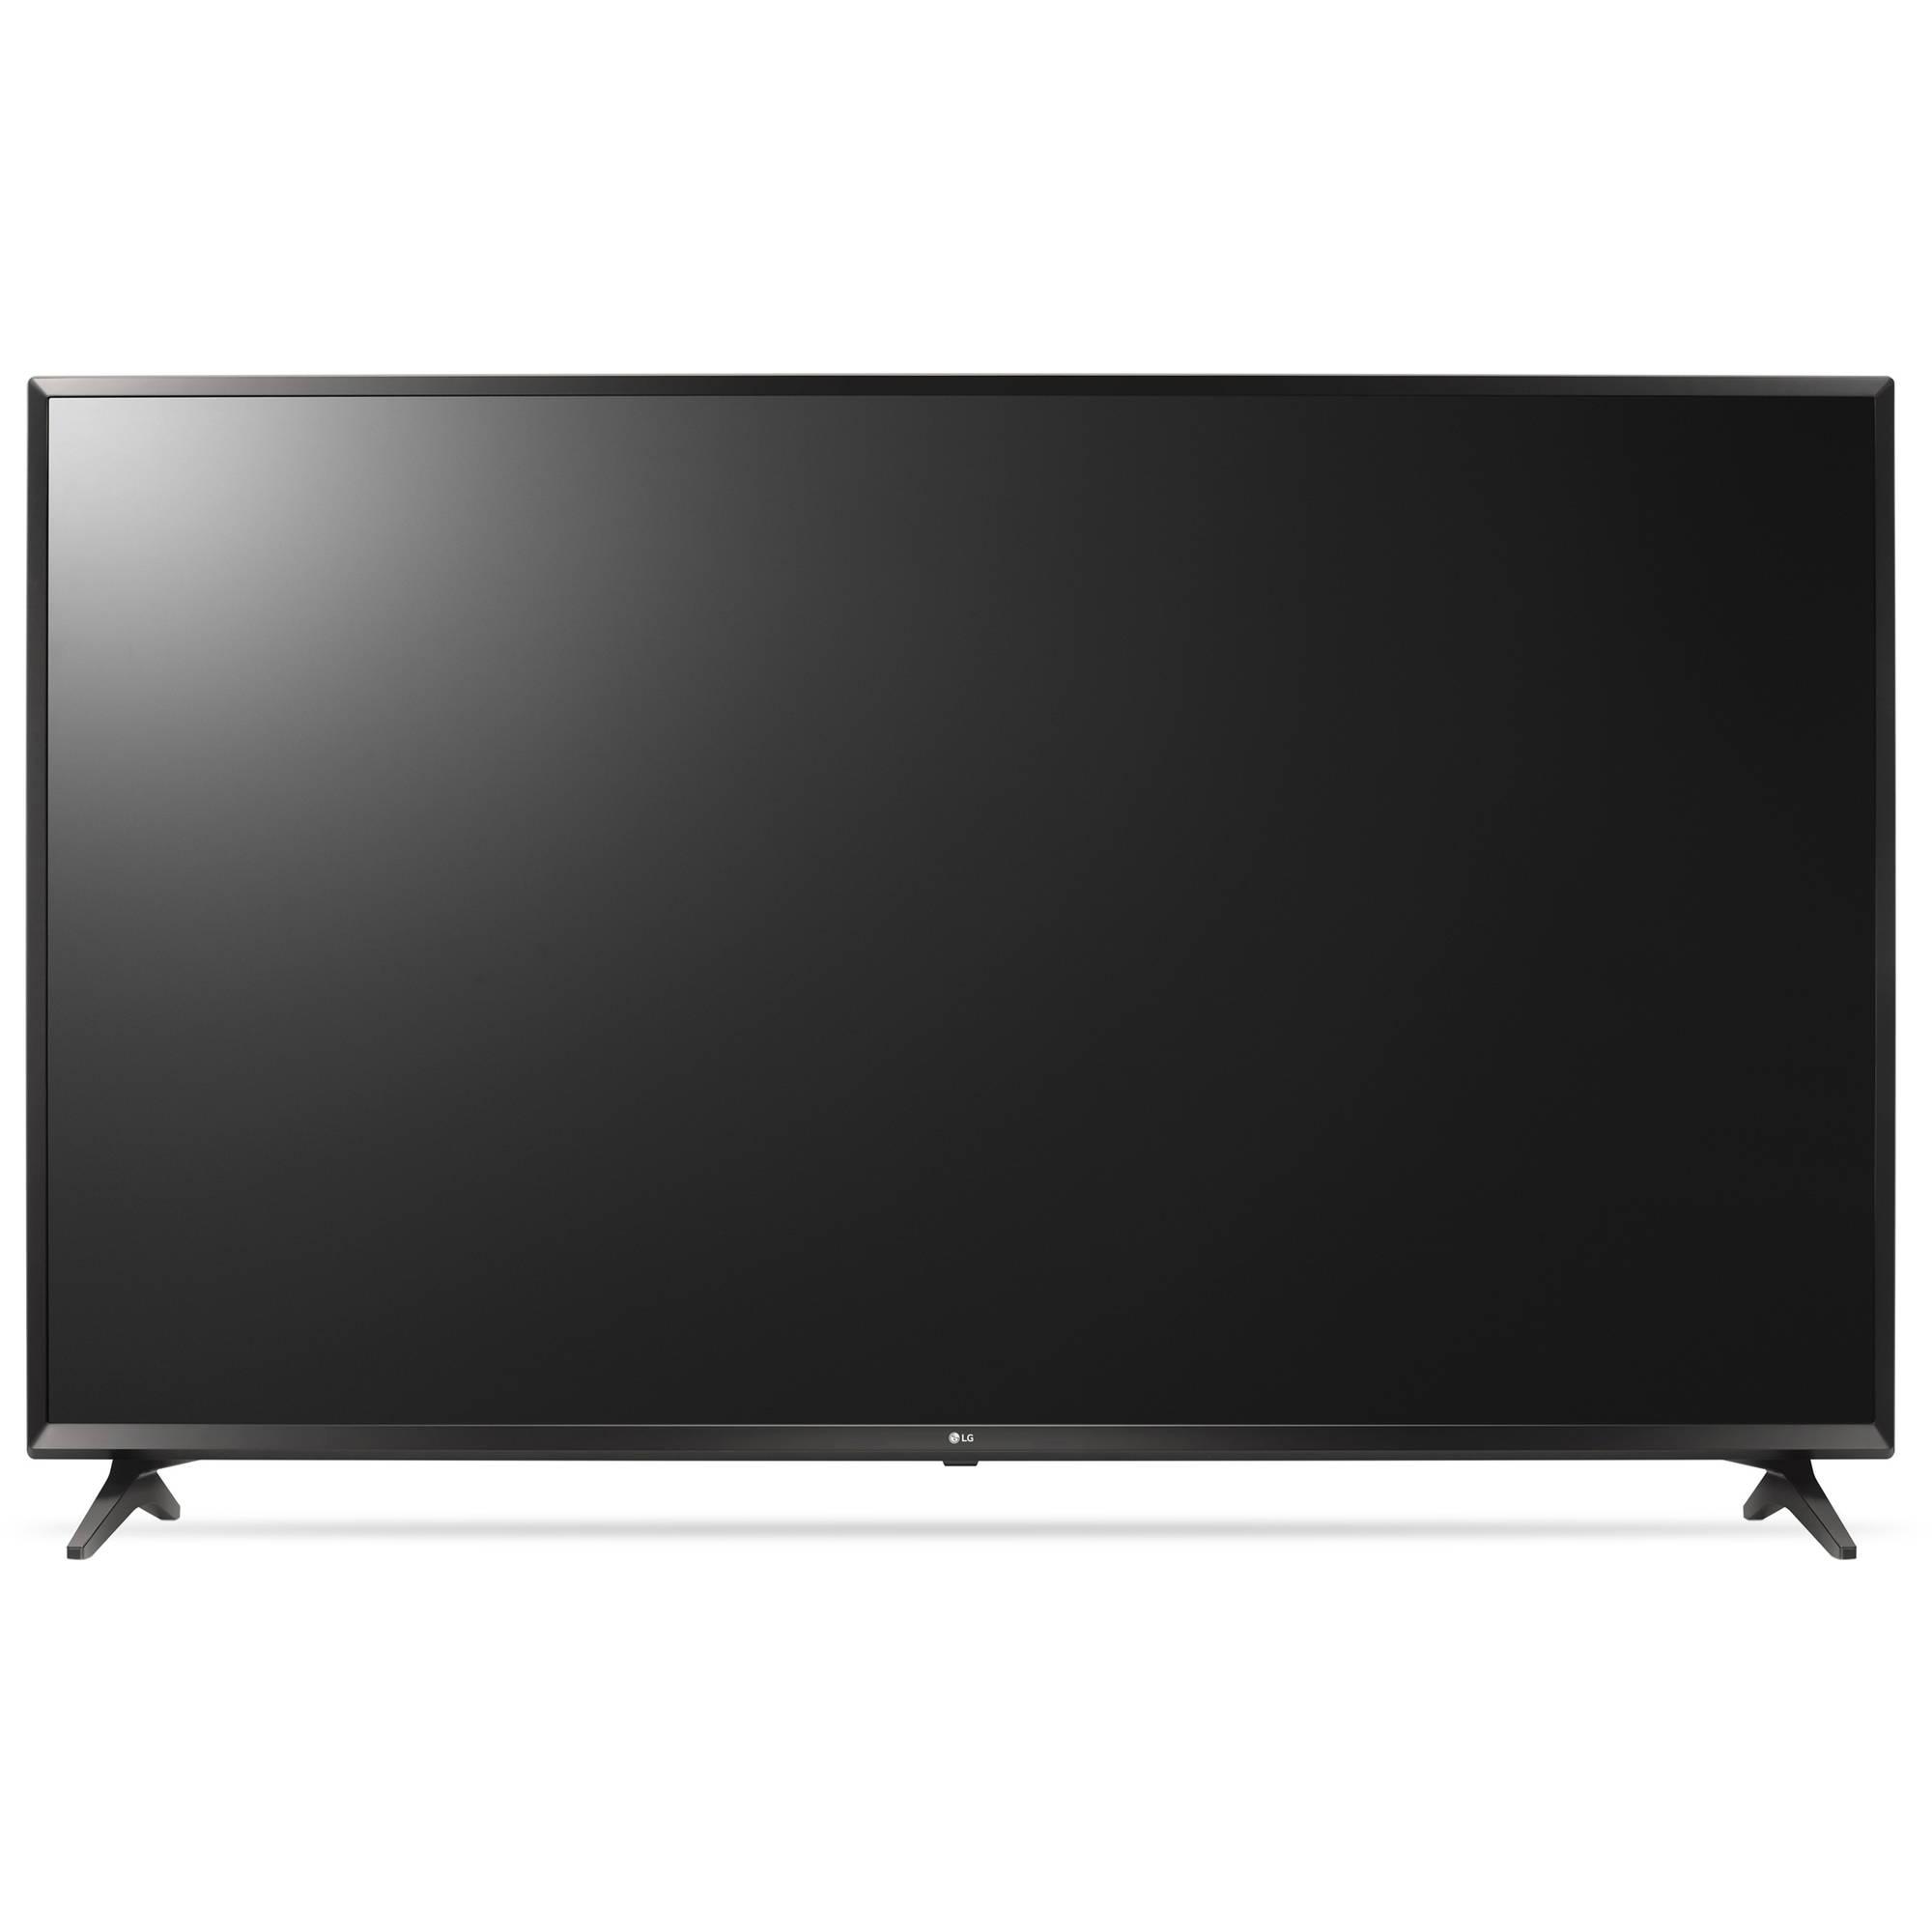 "LG 43"" Class 4K (2160p) Ultra HD Smart LED TV (43UJ6300)"